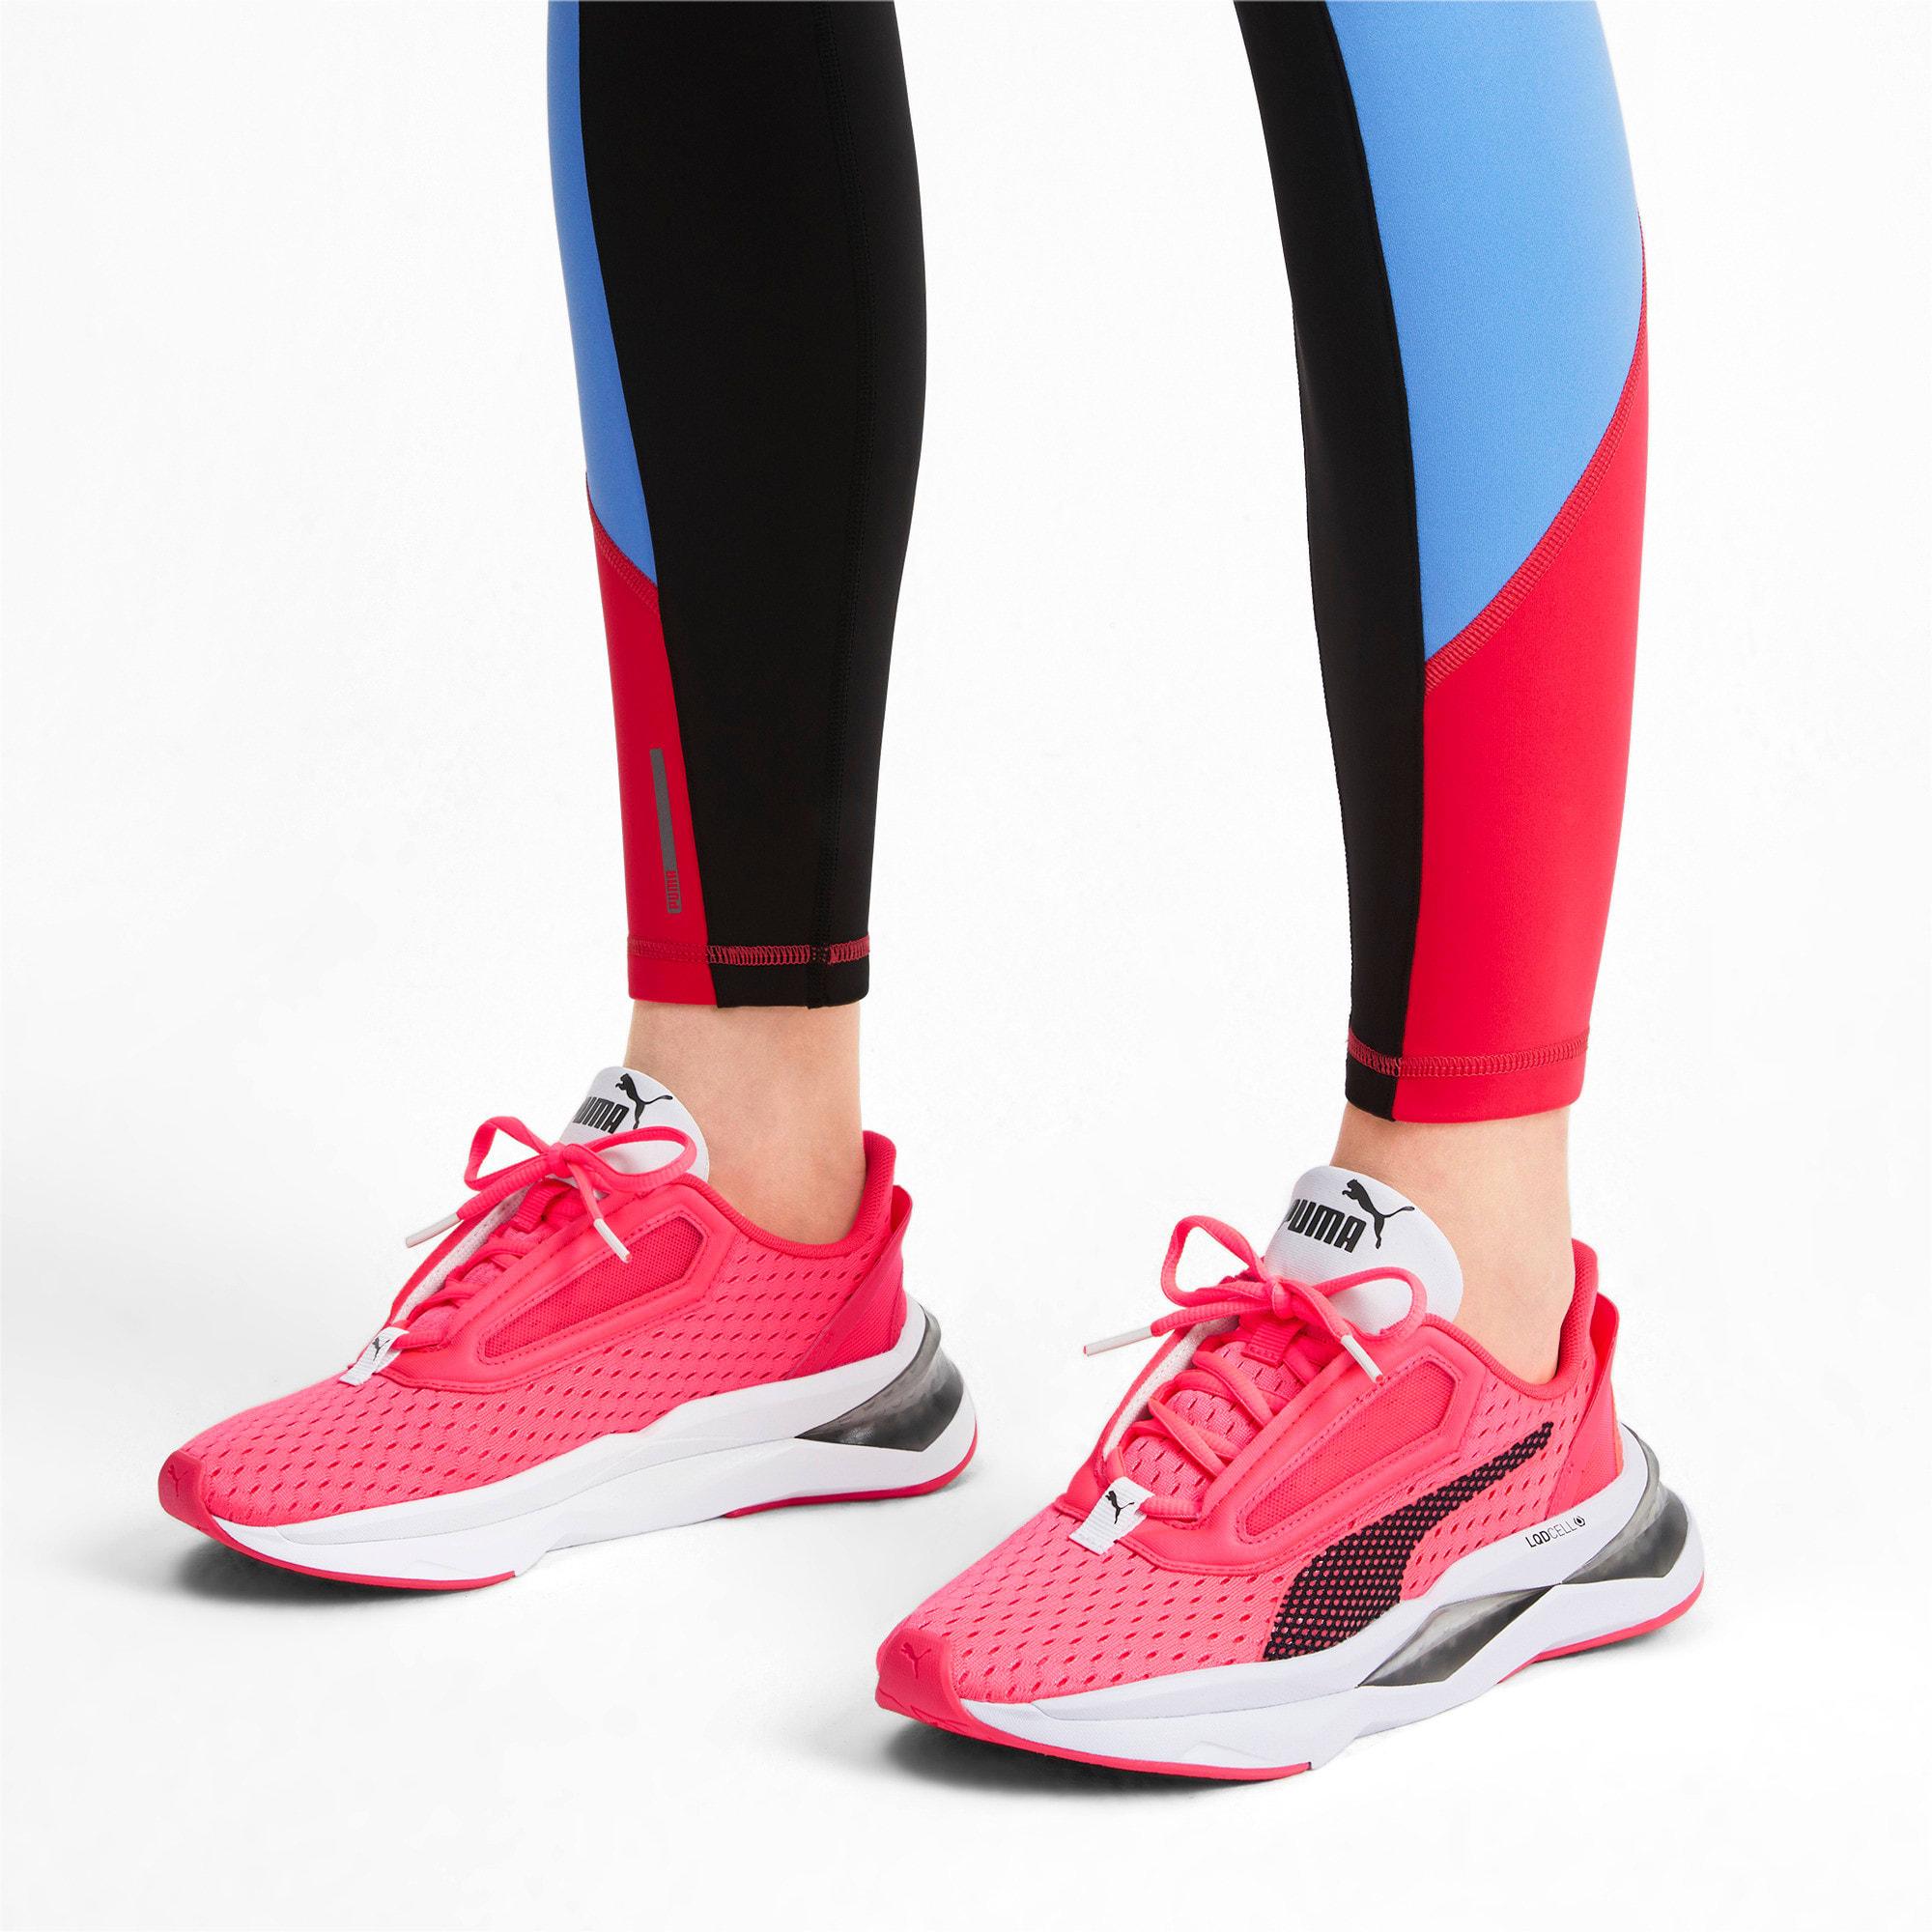 Thumbnail 2 of LQDCELL Shatter XT Women's Training Shoes, Pink Alert-Puma White, medium